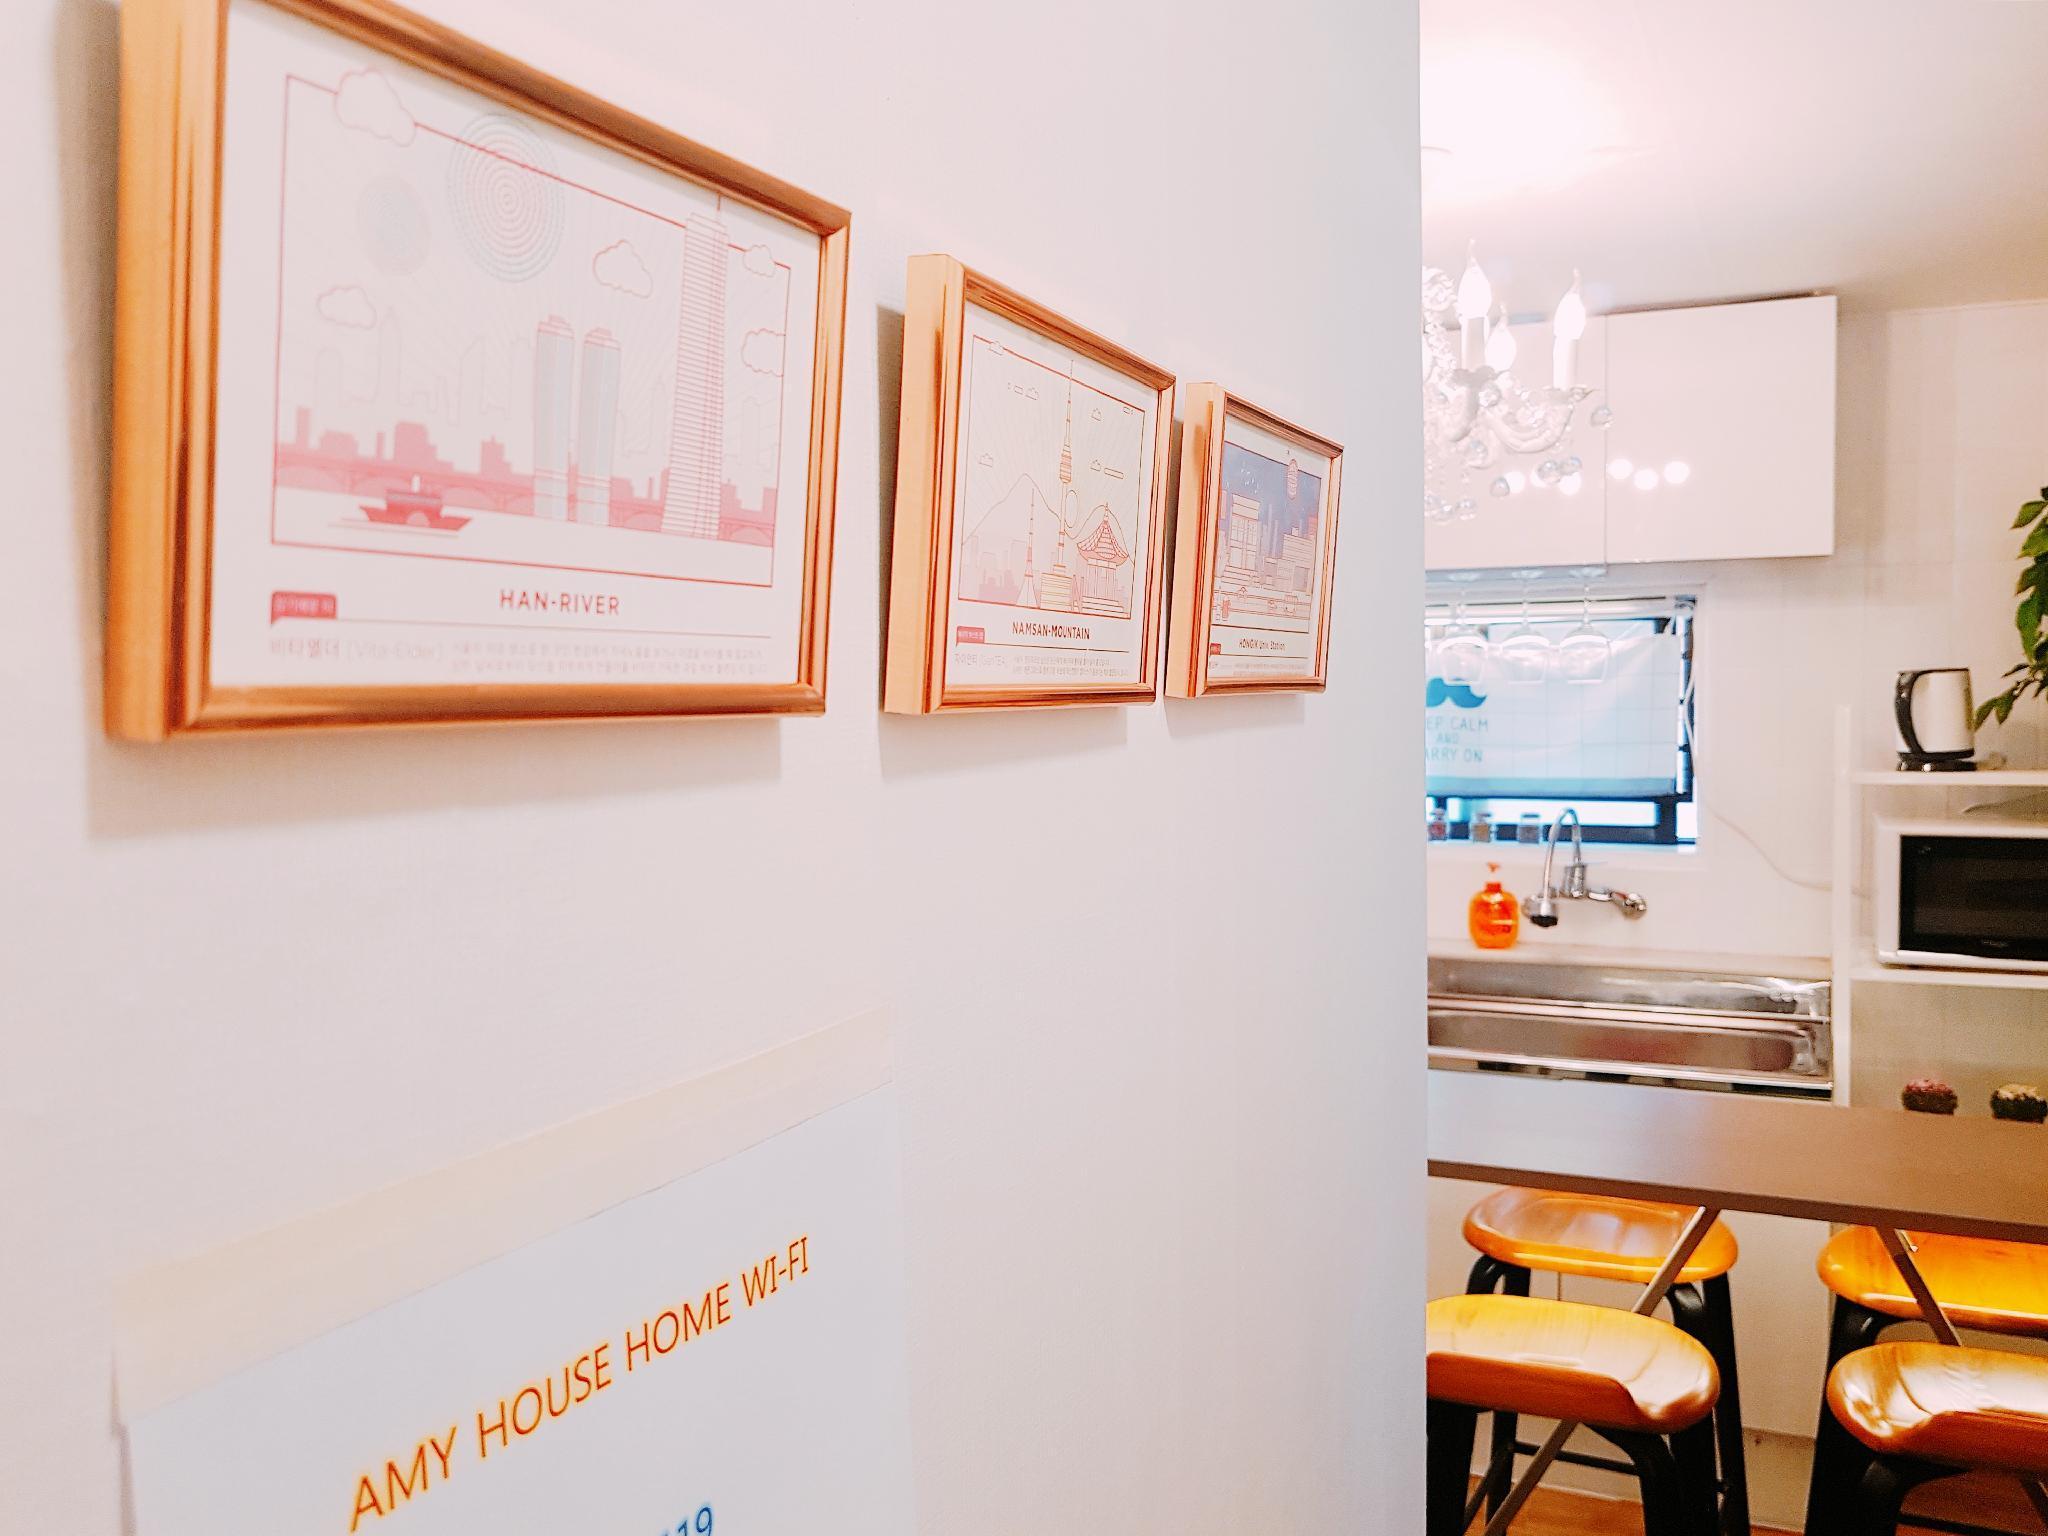 2 Hongdae Amy House  2 Rooms